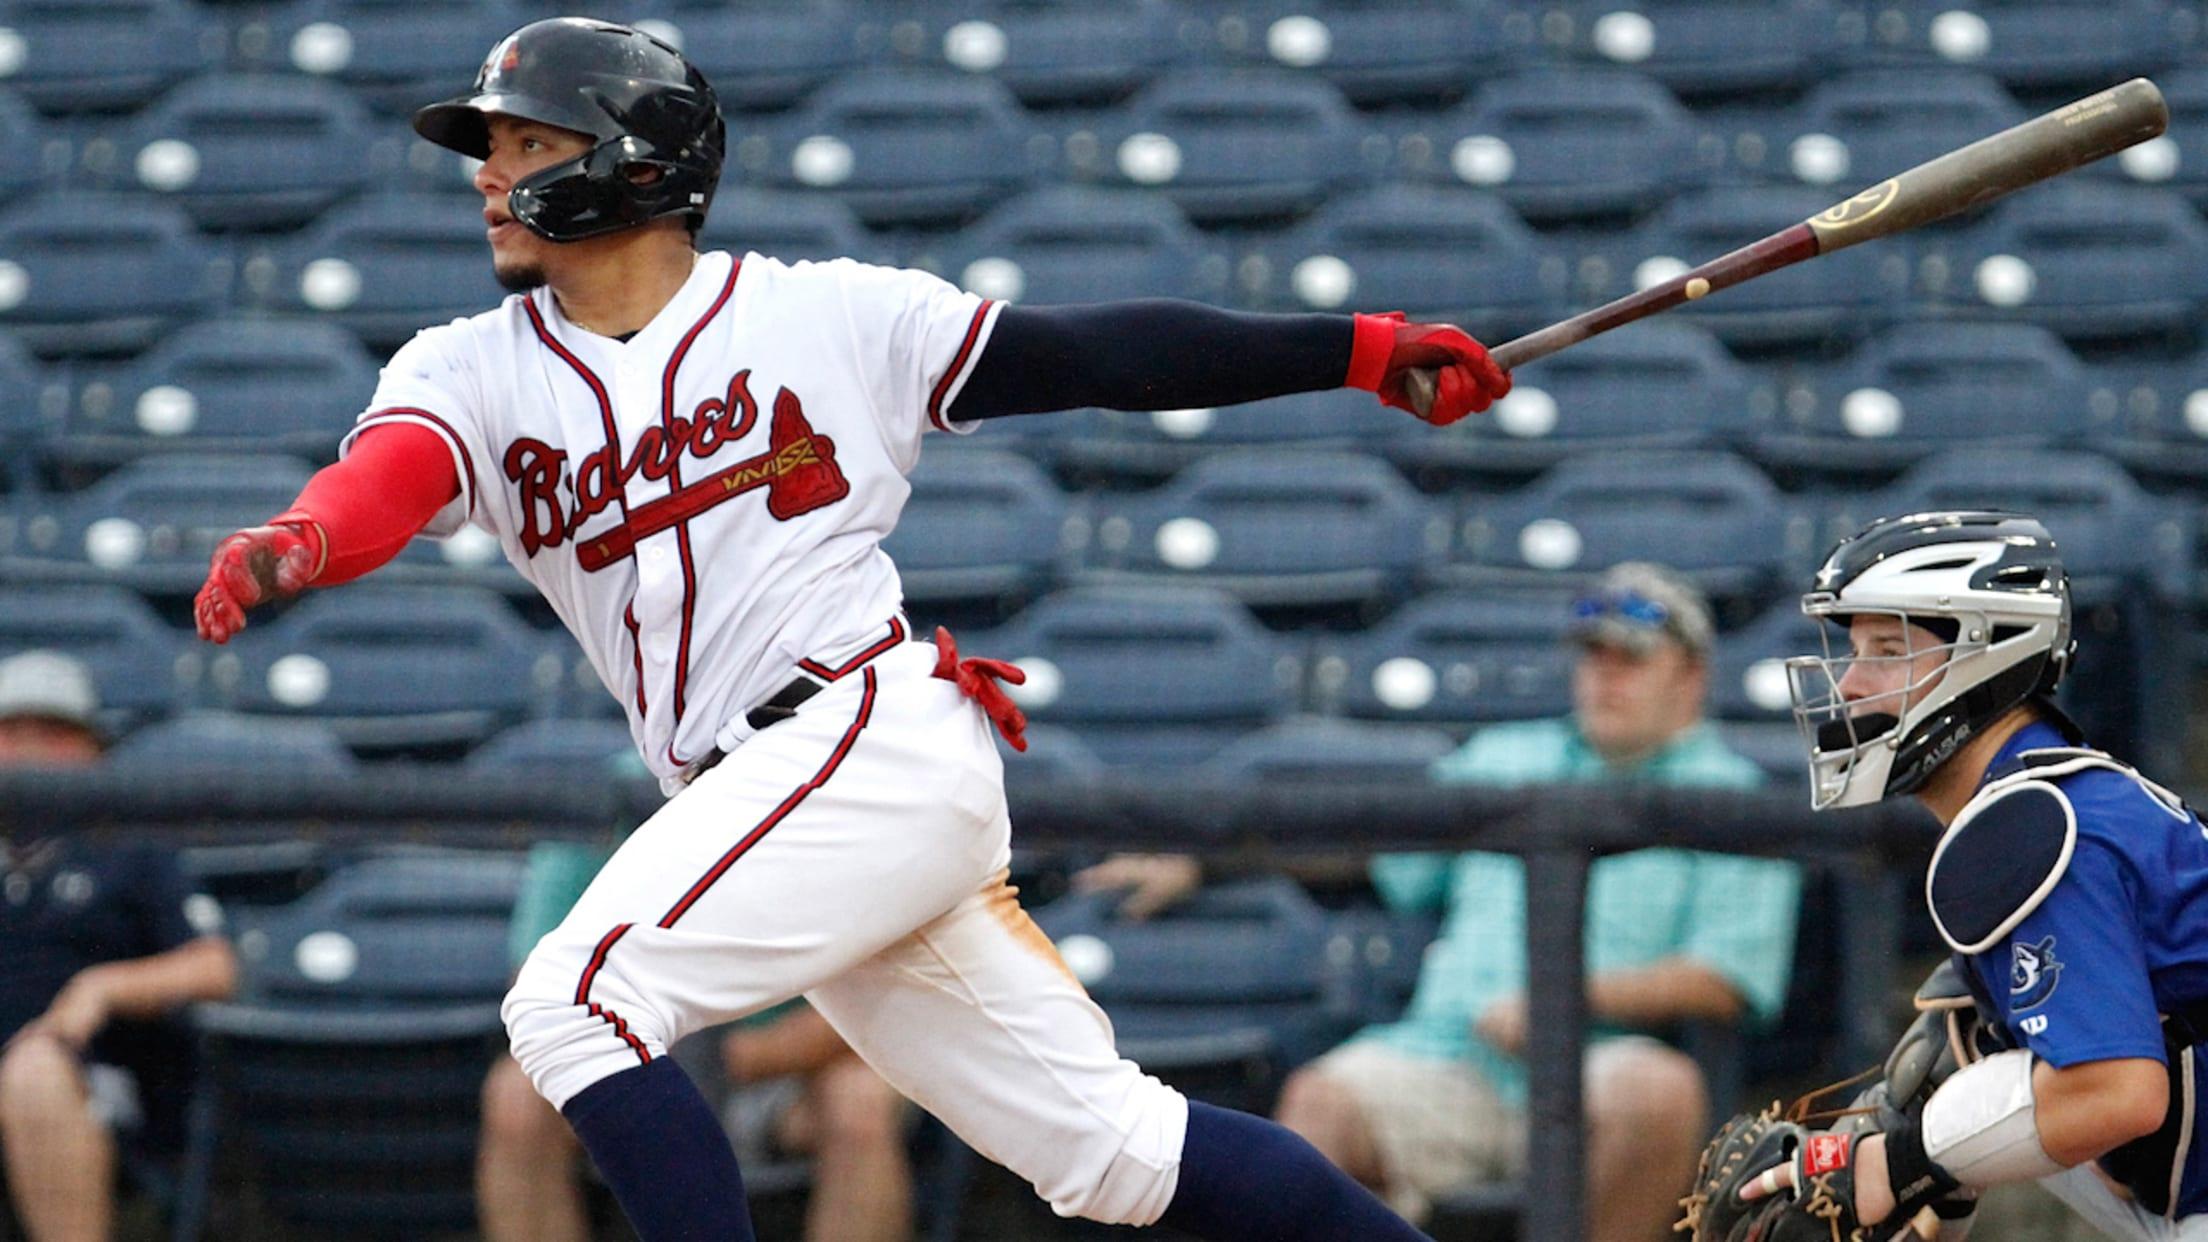 Top Prospects: Contreras, ATL